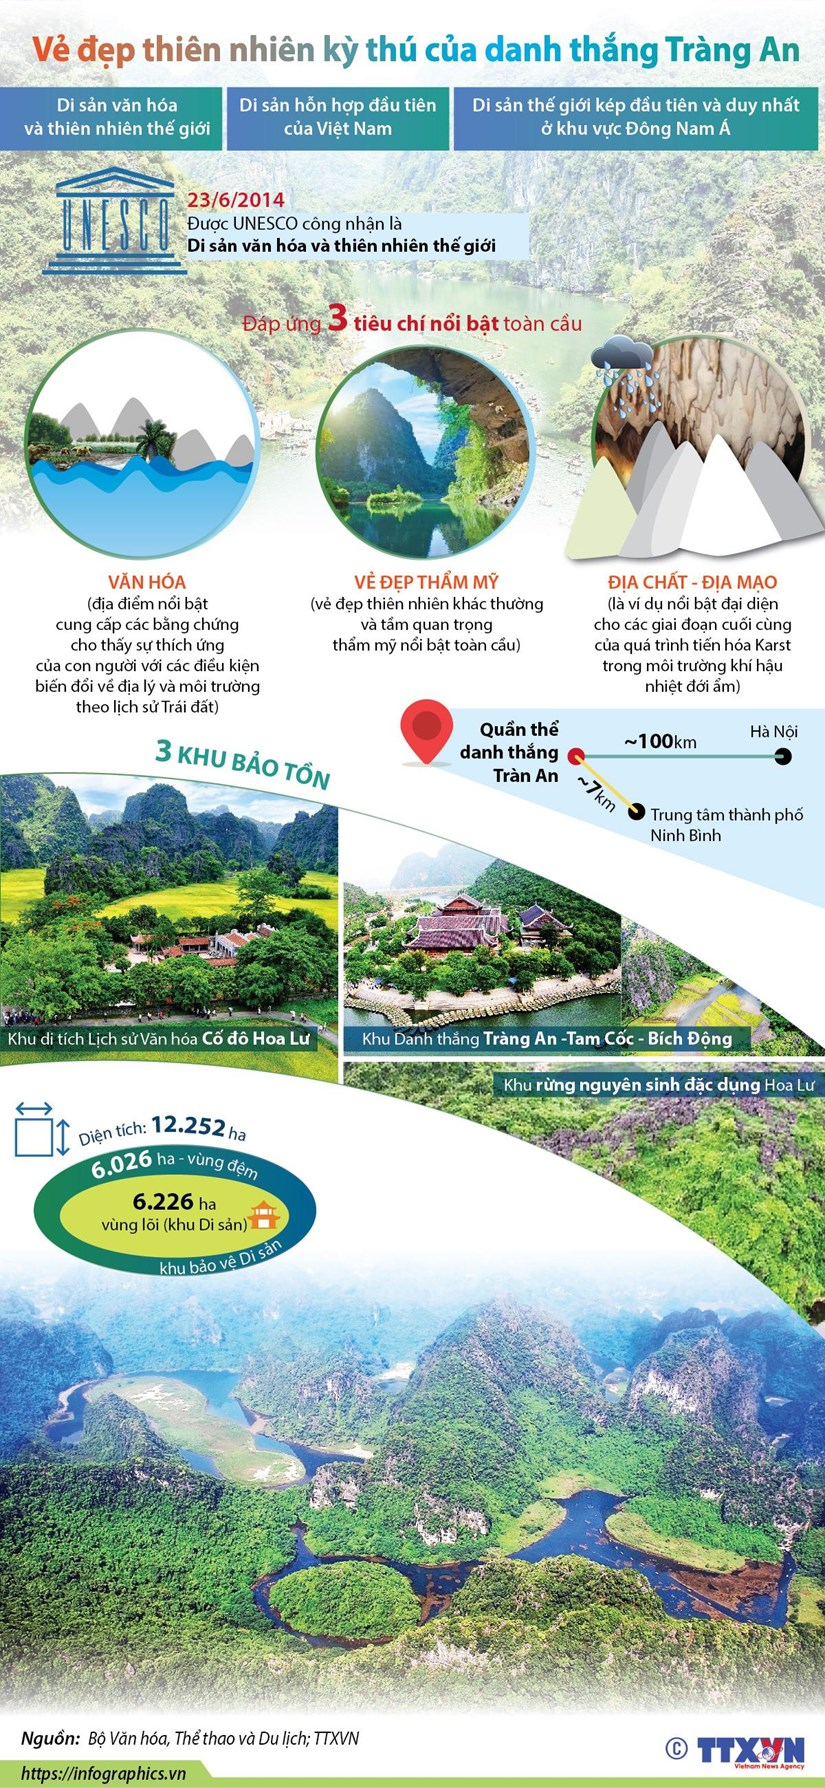 [Infographics] Ve dep thien nhien ky thu cua danh thang Trang An hinh anh 1